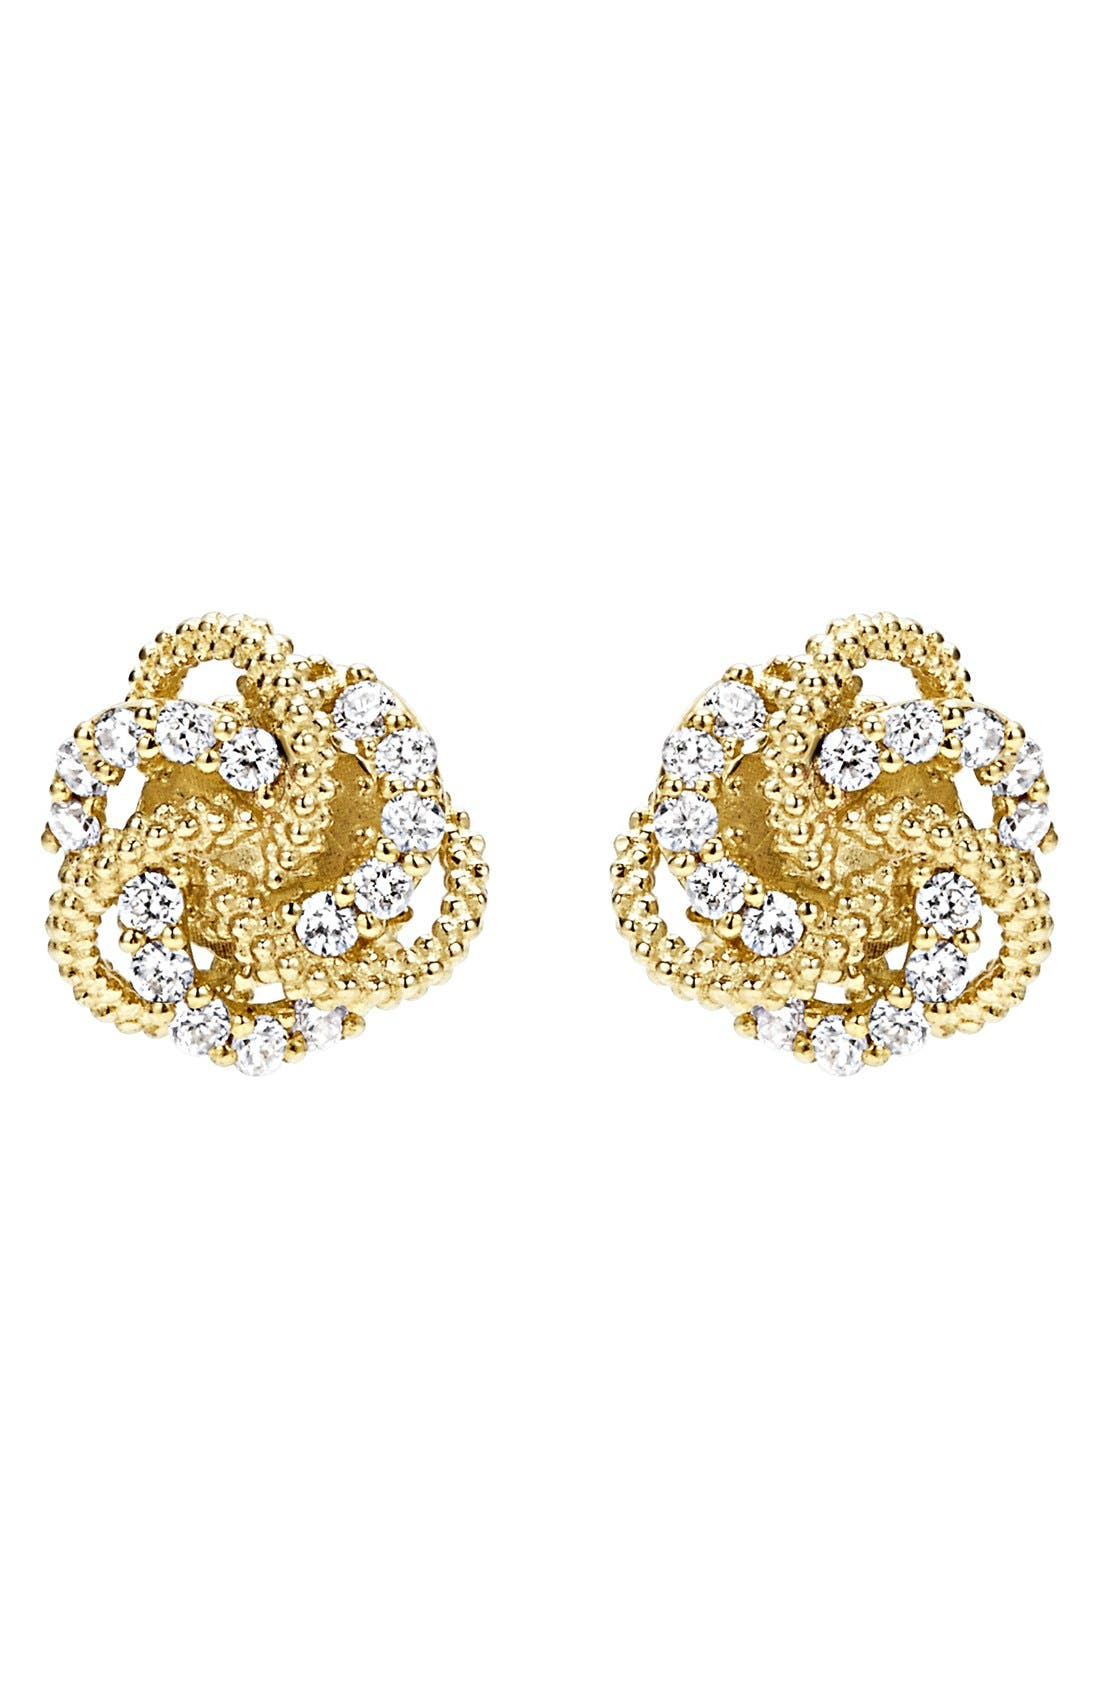 'Love Knot' Stud Earrings,                             Alternate thumbnail 3, color,                             GOLD